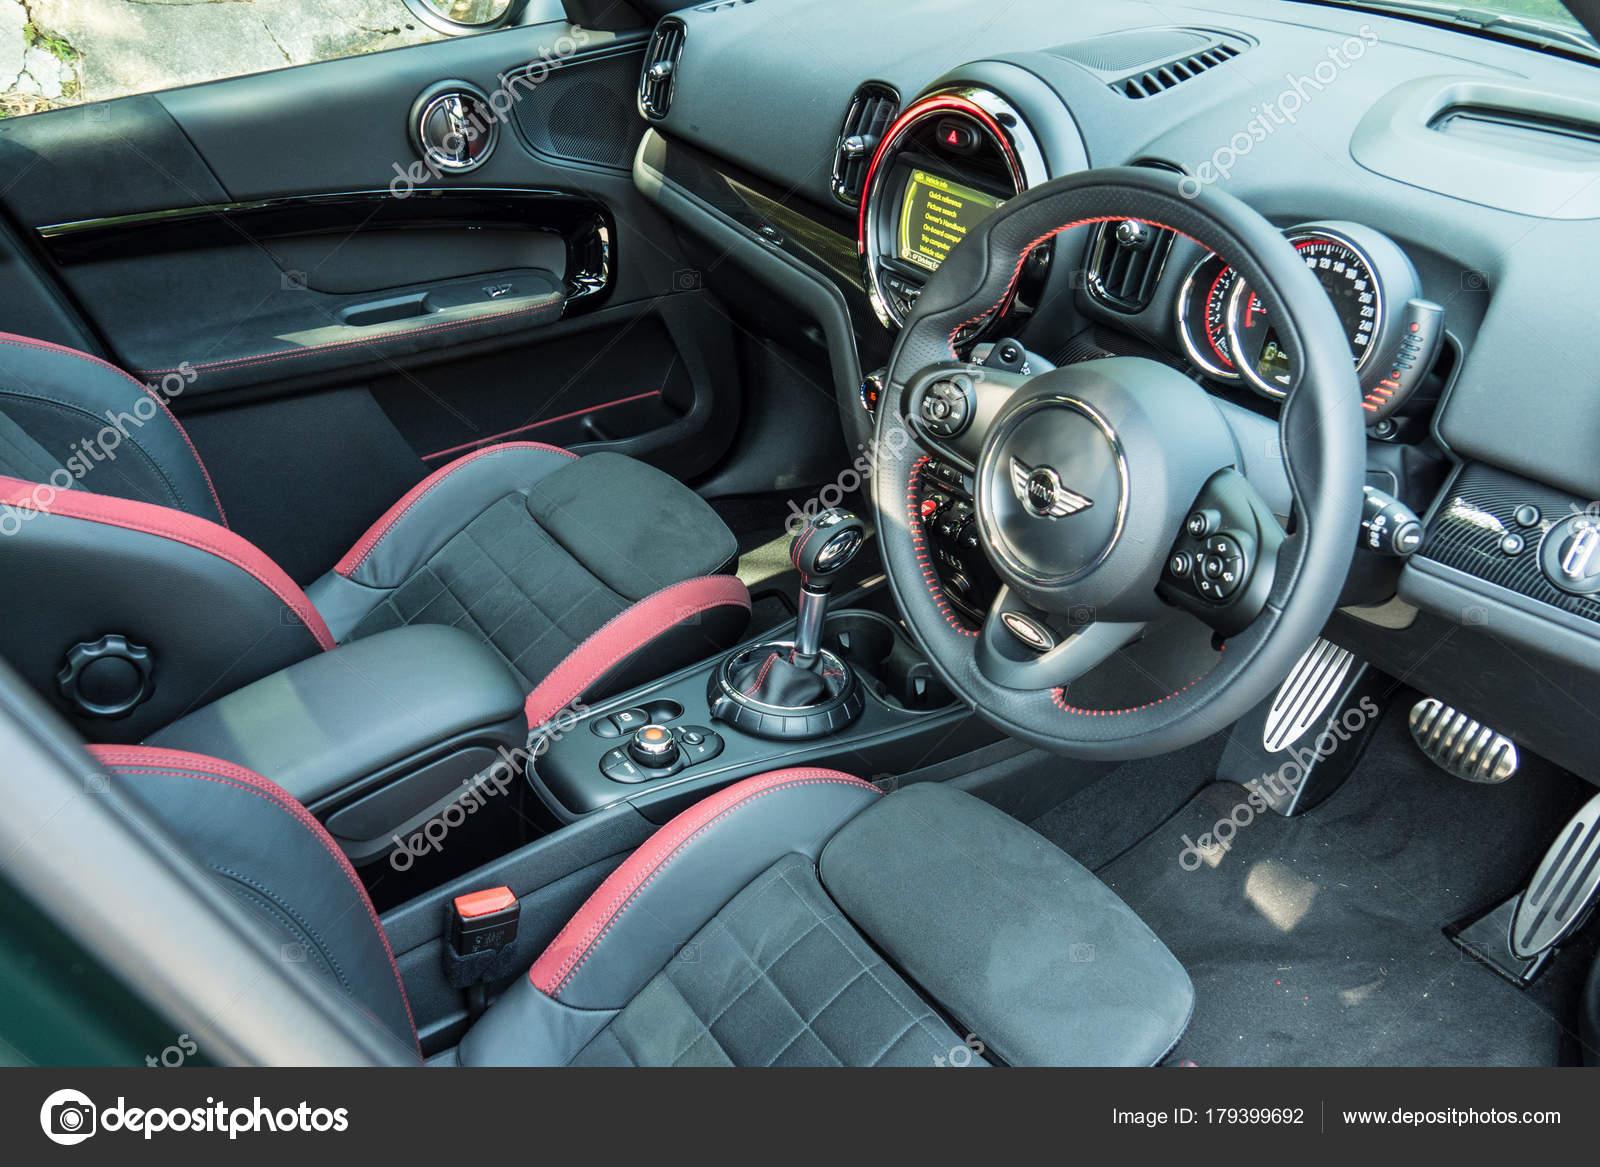 Mini Jcw Landsmann 2017 Interieur — Redaktionelles Stockfoto ...